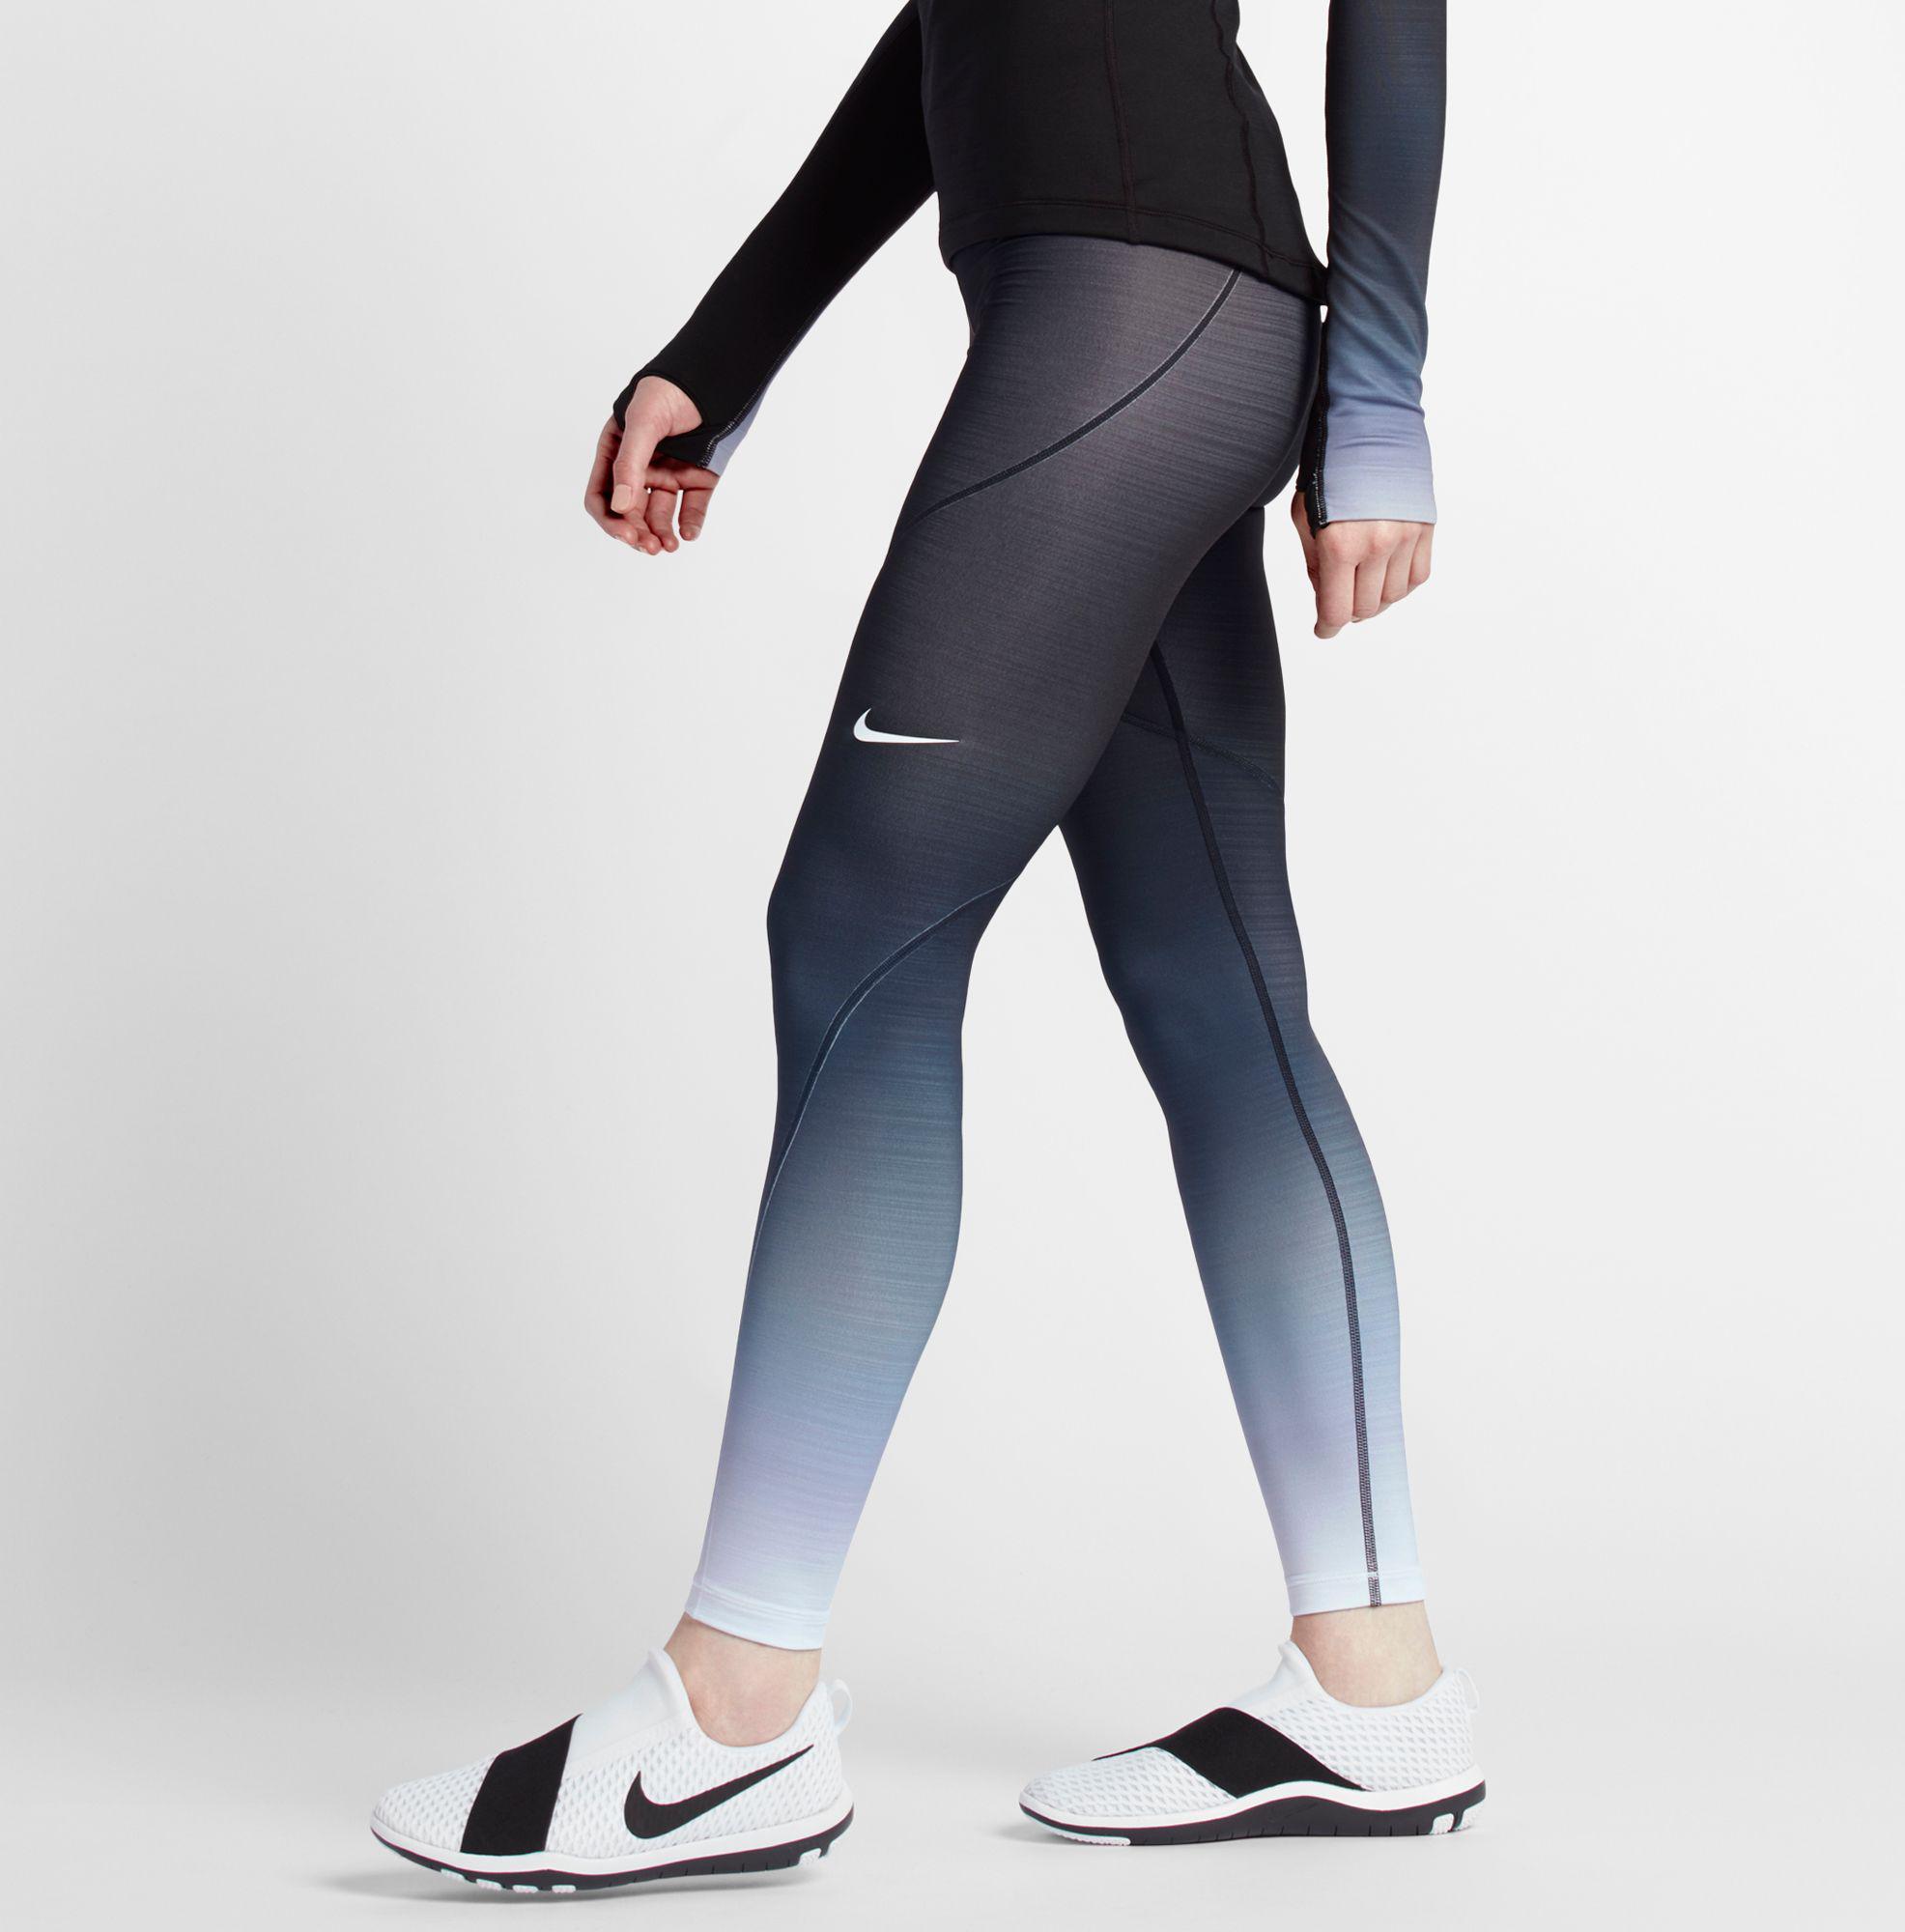 099649ccd7c89 Nike Pro Hyperwarm Fade Printed Tights in Black - Lyst